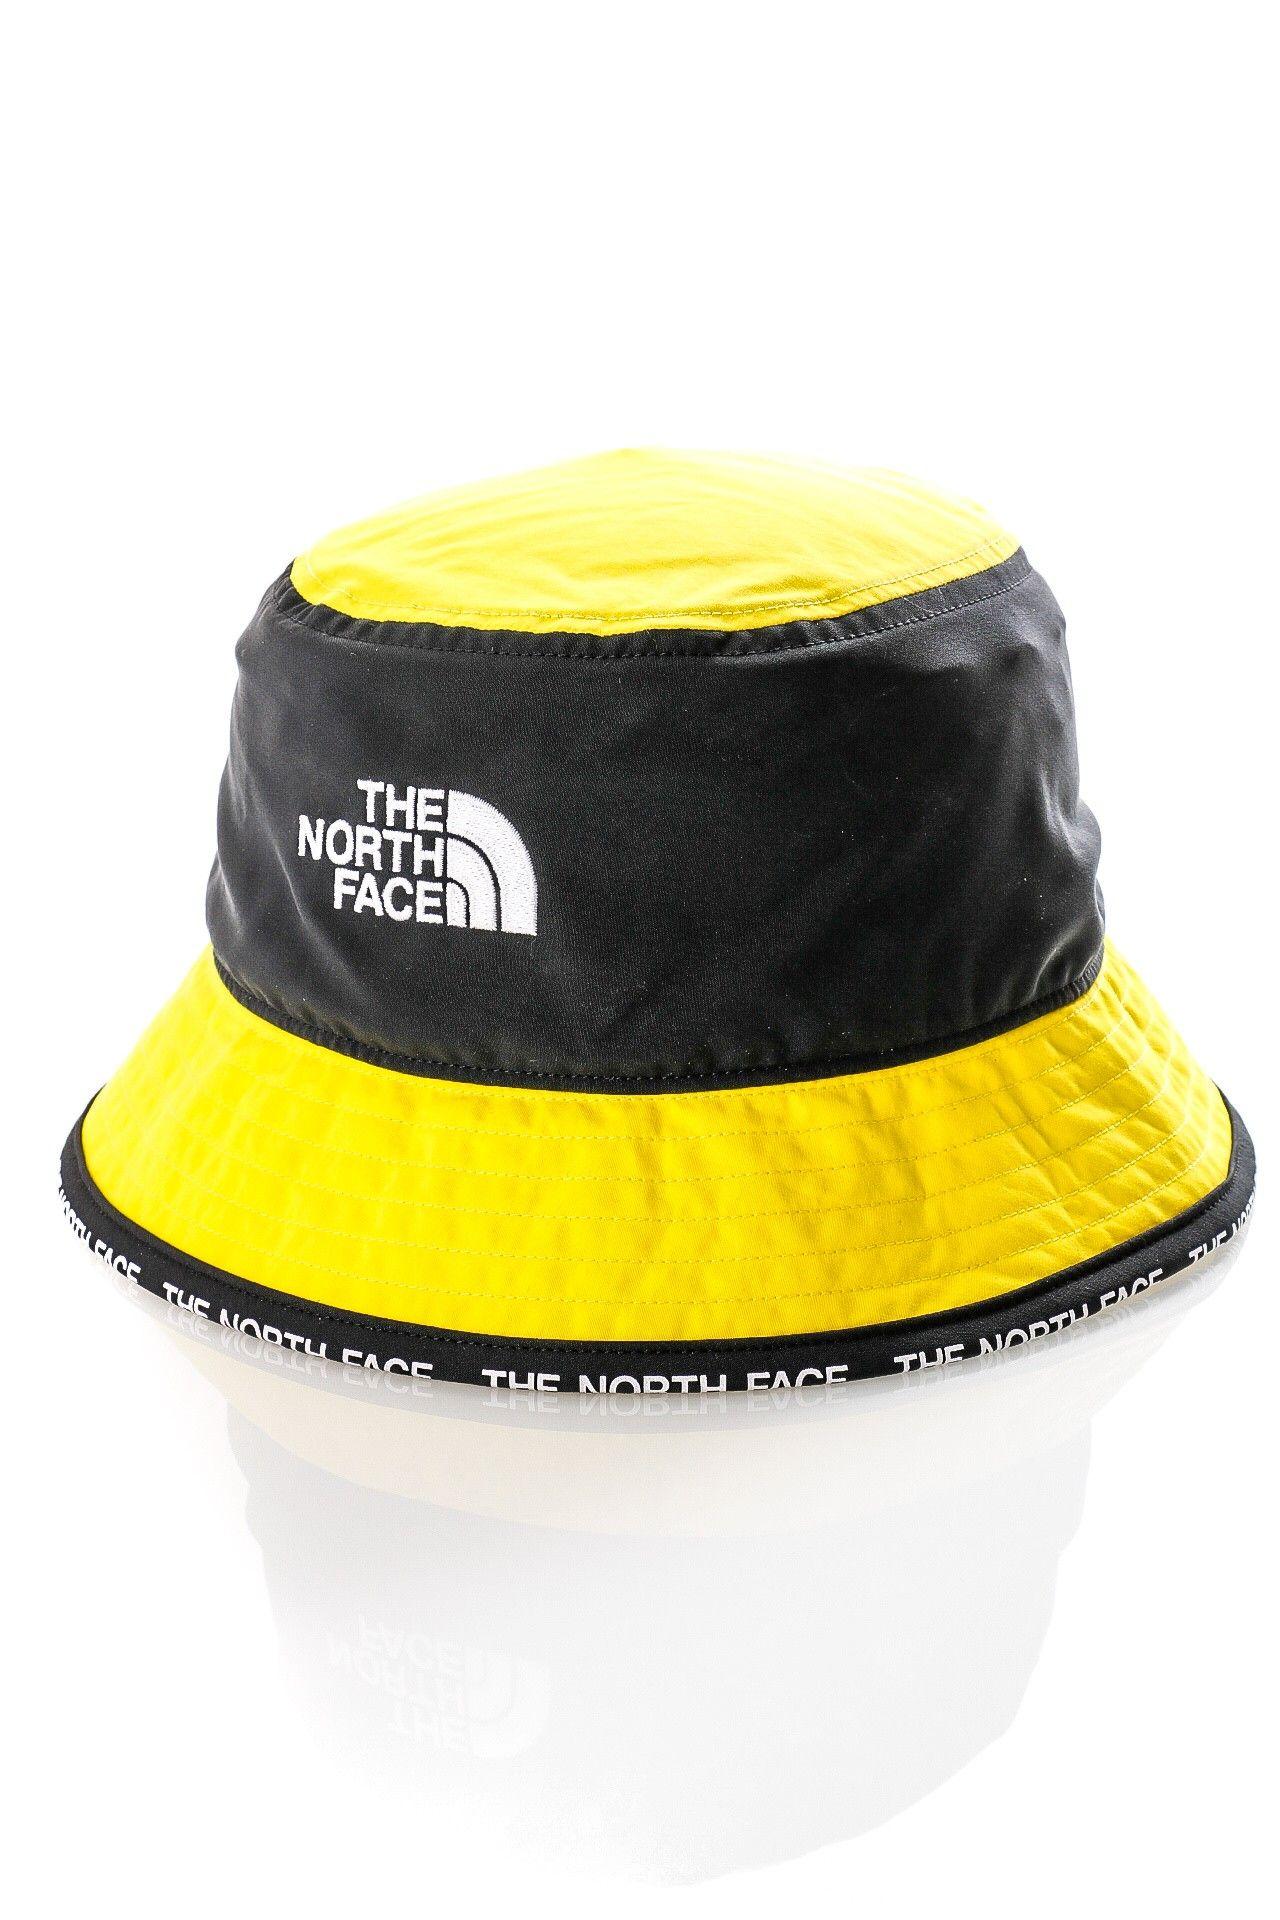 Afbeelding van The North Face Bucket Hat Cypress Bucket Hat TNF Sulphur SPR NF0A3VVKJE3